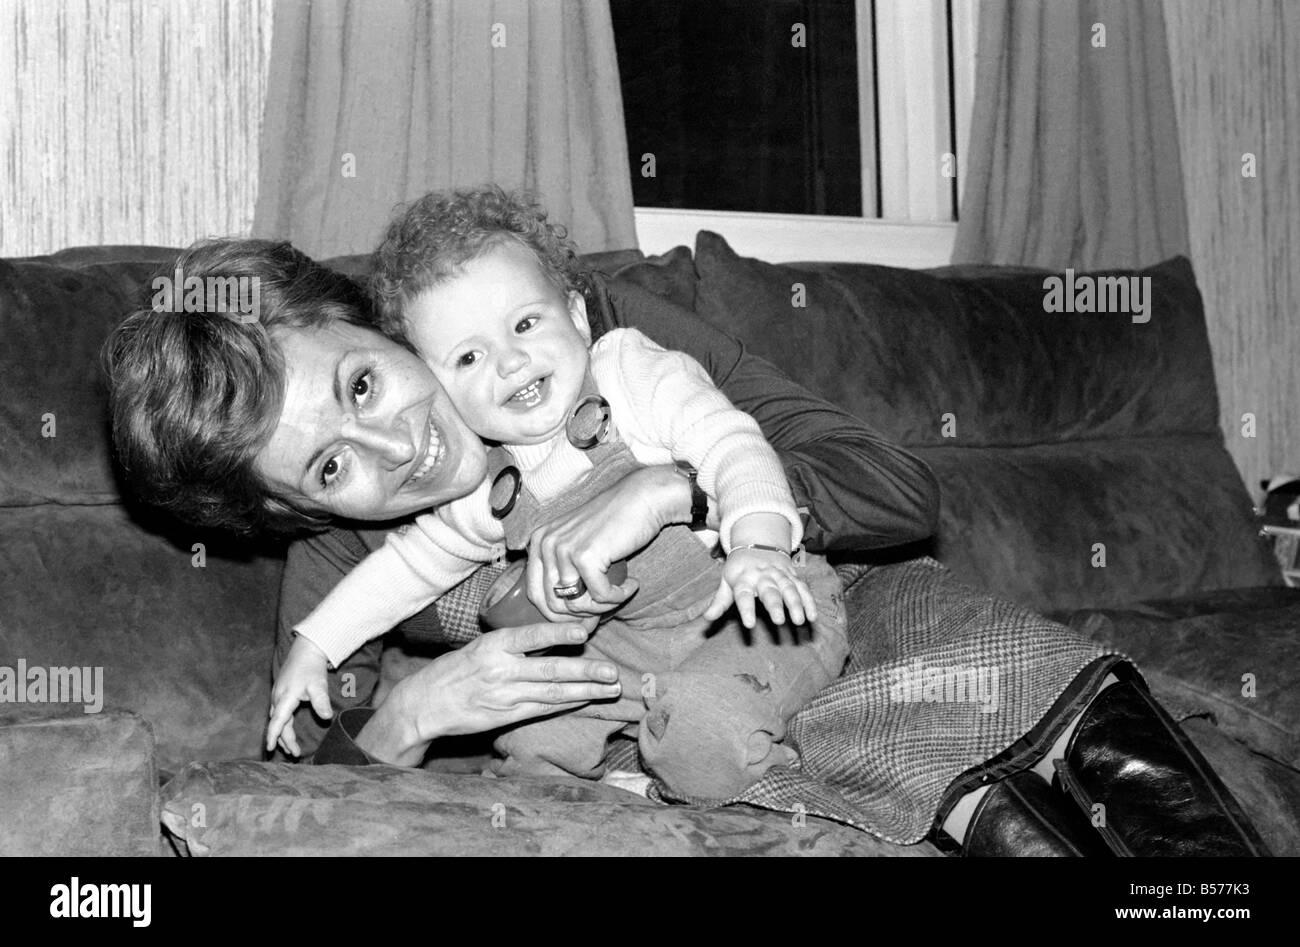 International singer star: Caterina Valente serenades her son. February 1975 75-00827-004 - Stock Image